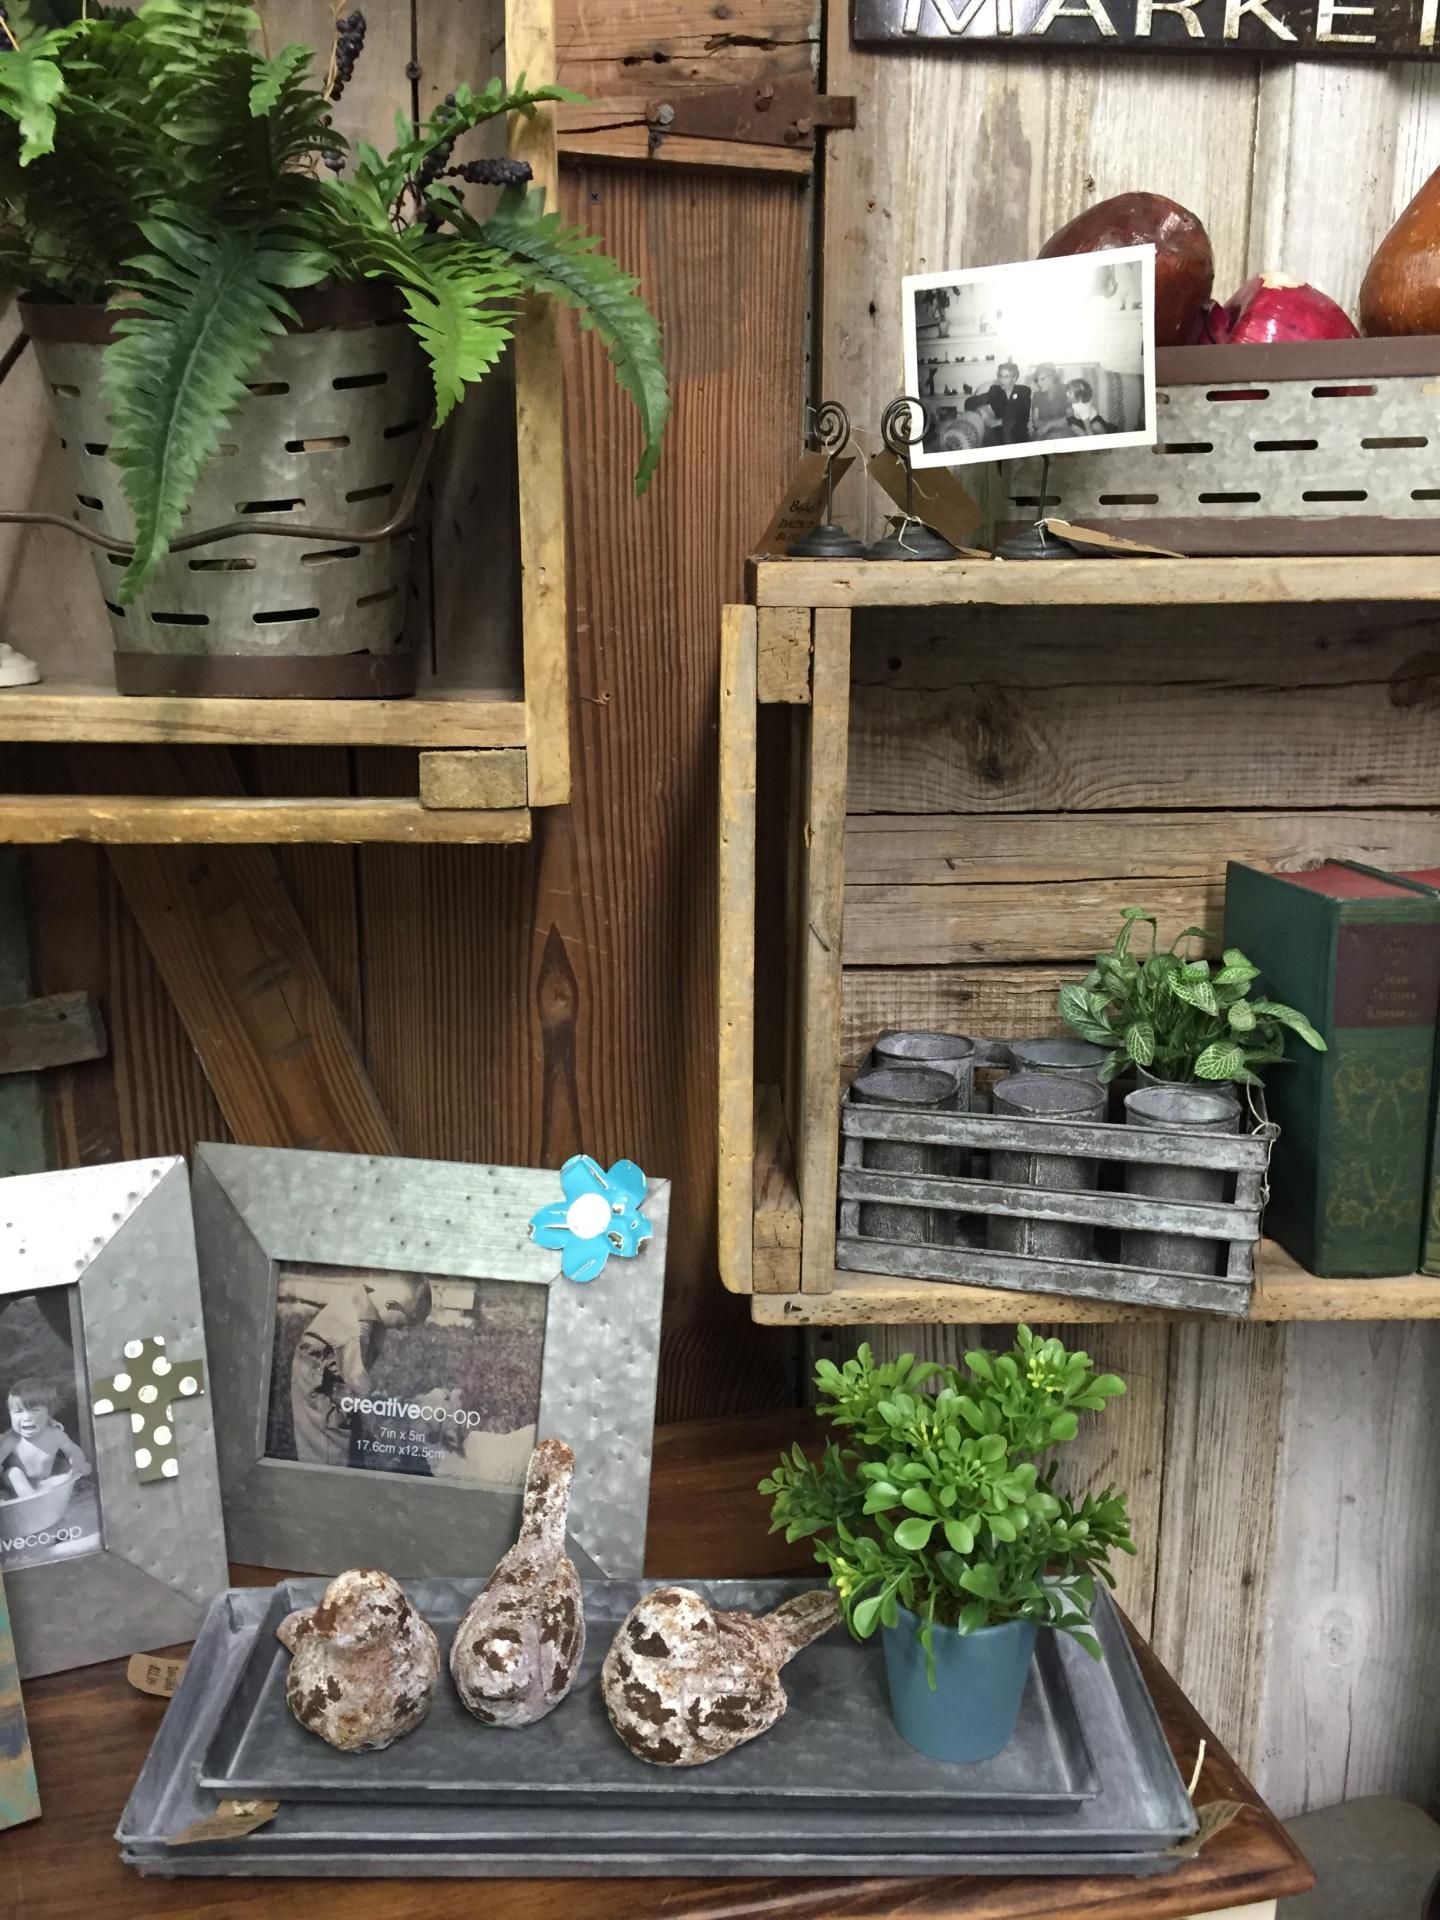 Metal frames, book ends, metal baskets, yard decor, seasonal decorations